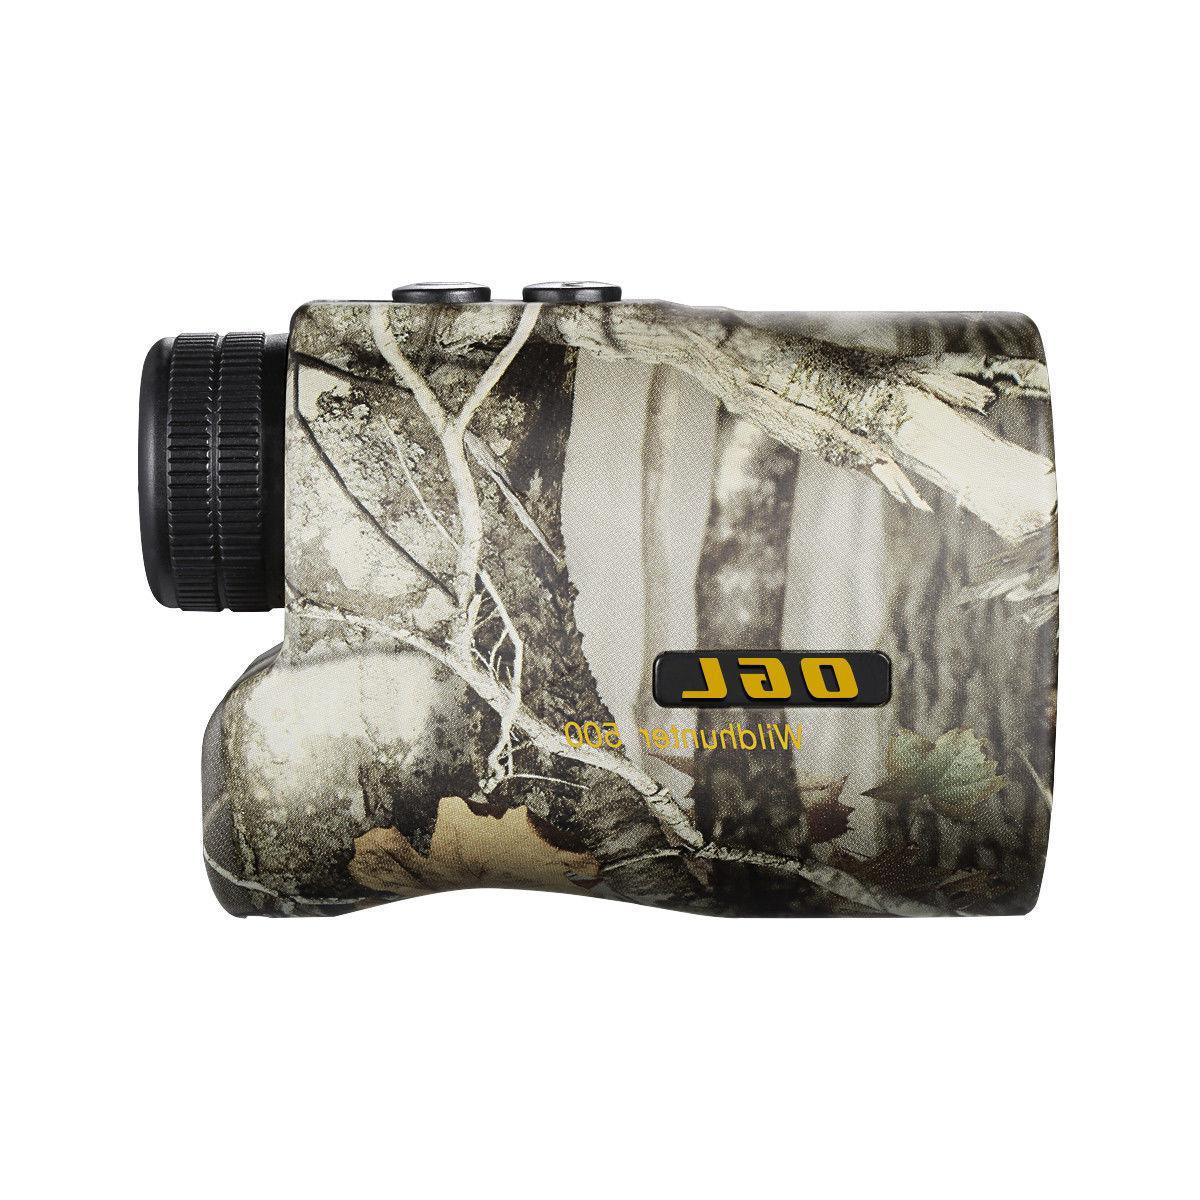 OGL Wild Hunting Laser Range - 540 Yard Range - Speed